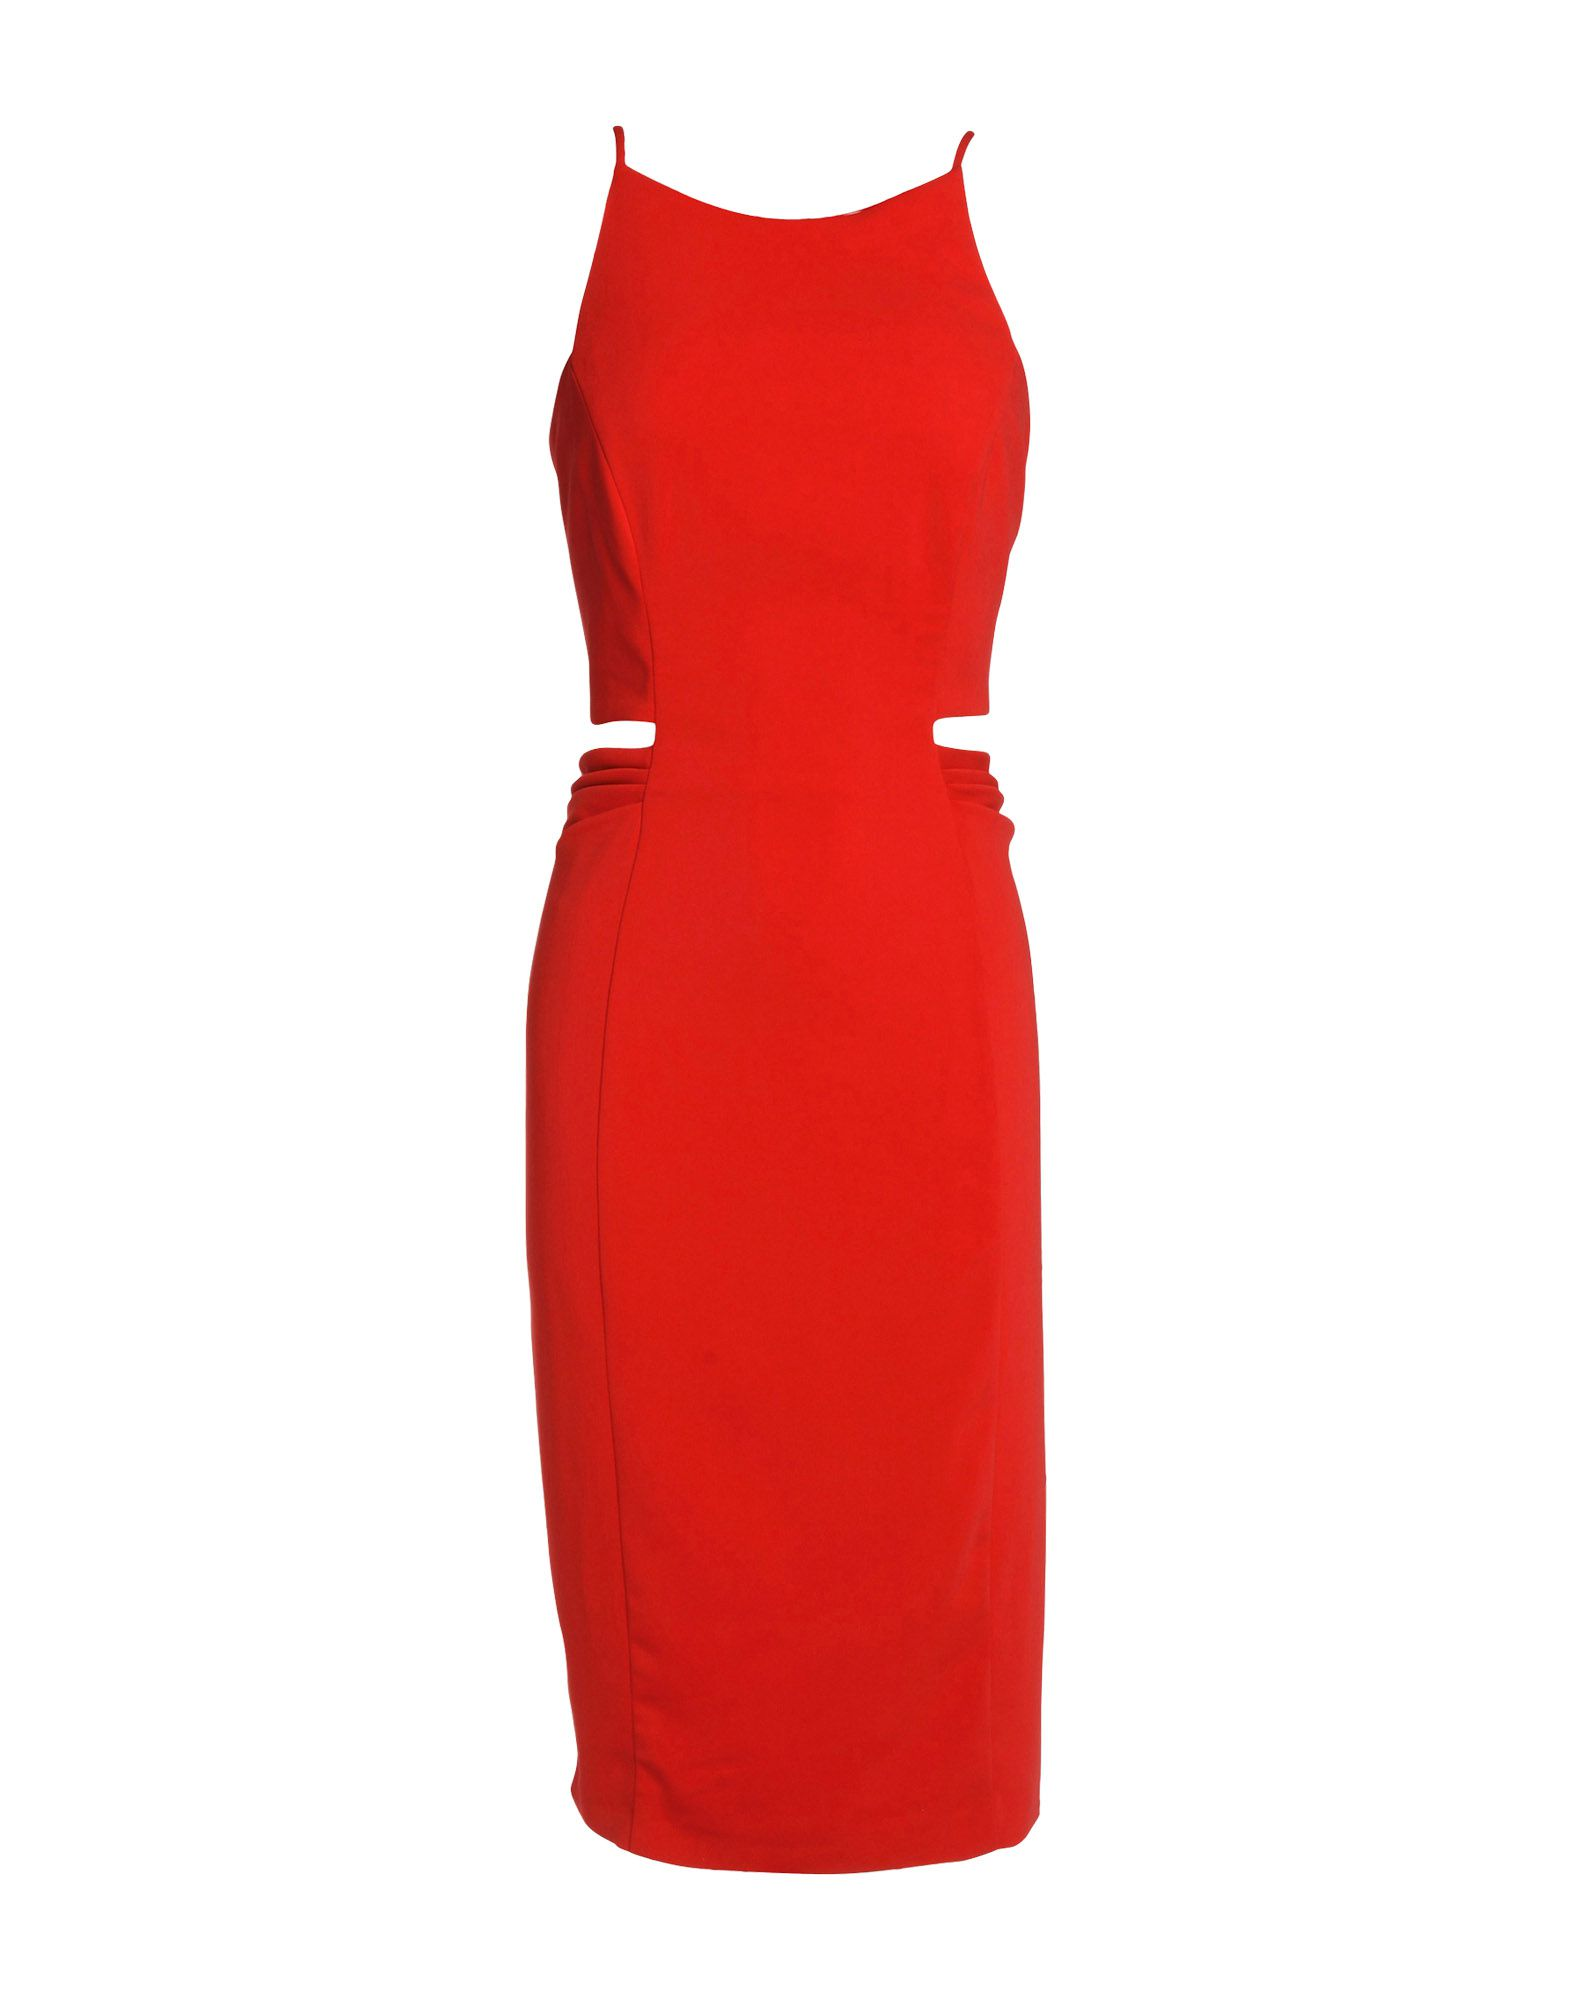 BADGLEY MISCHKA Платье до колена sly010 платье до колена